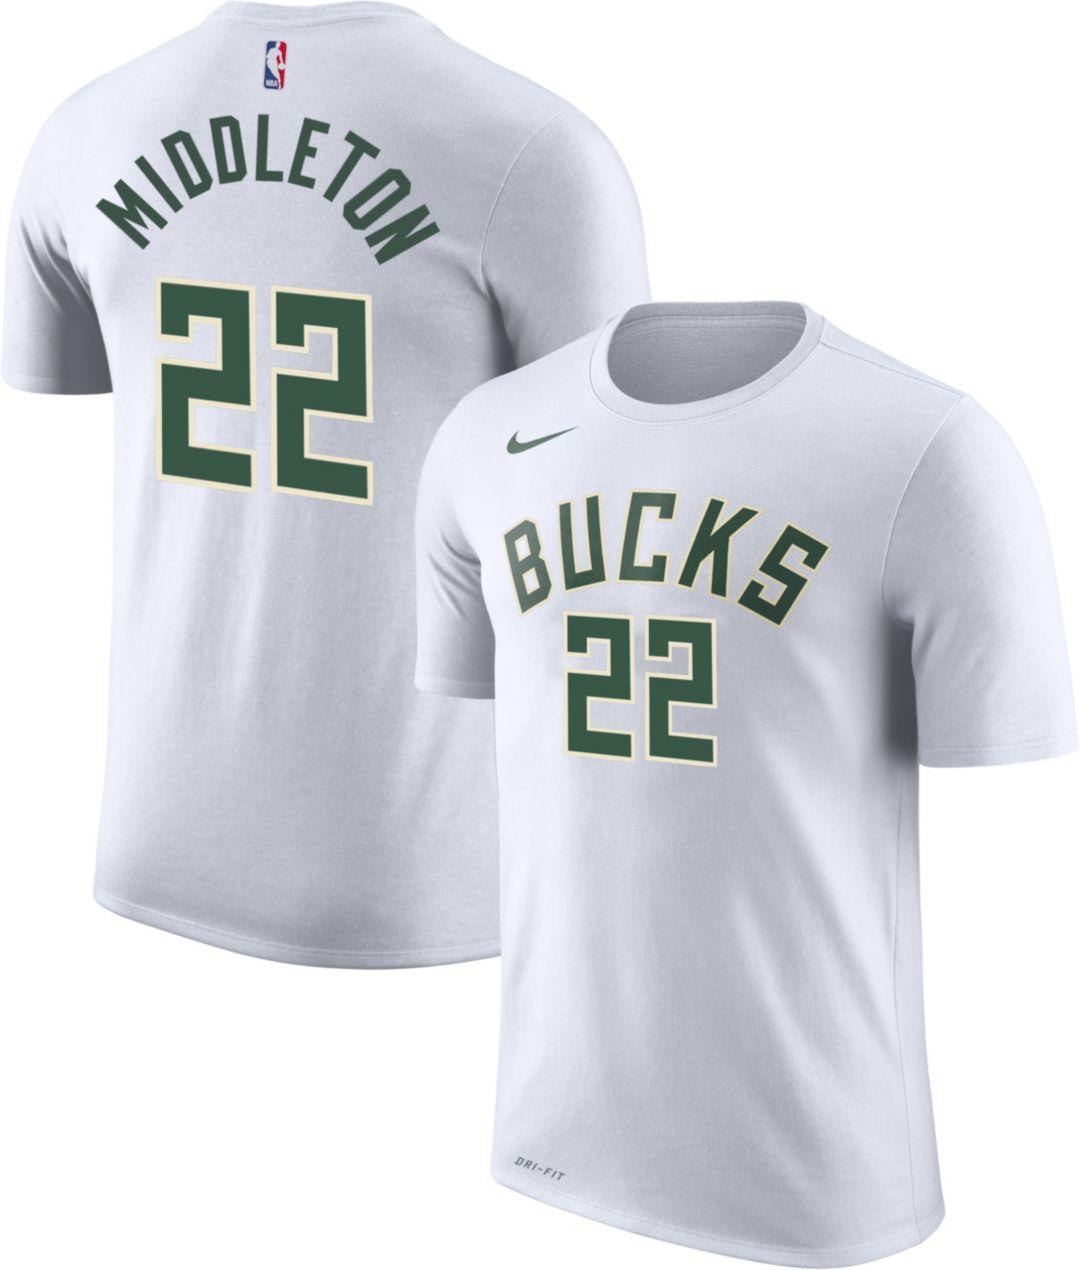 best website a0039 9e525 Nike Men's Milwaukee Bucks Khris Middleton #22 Dri-FIT White T-Shirt